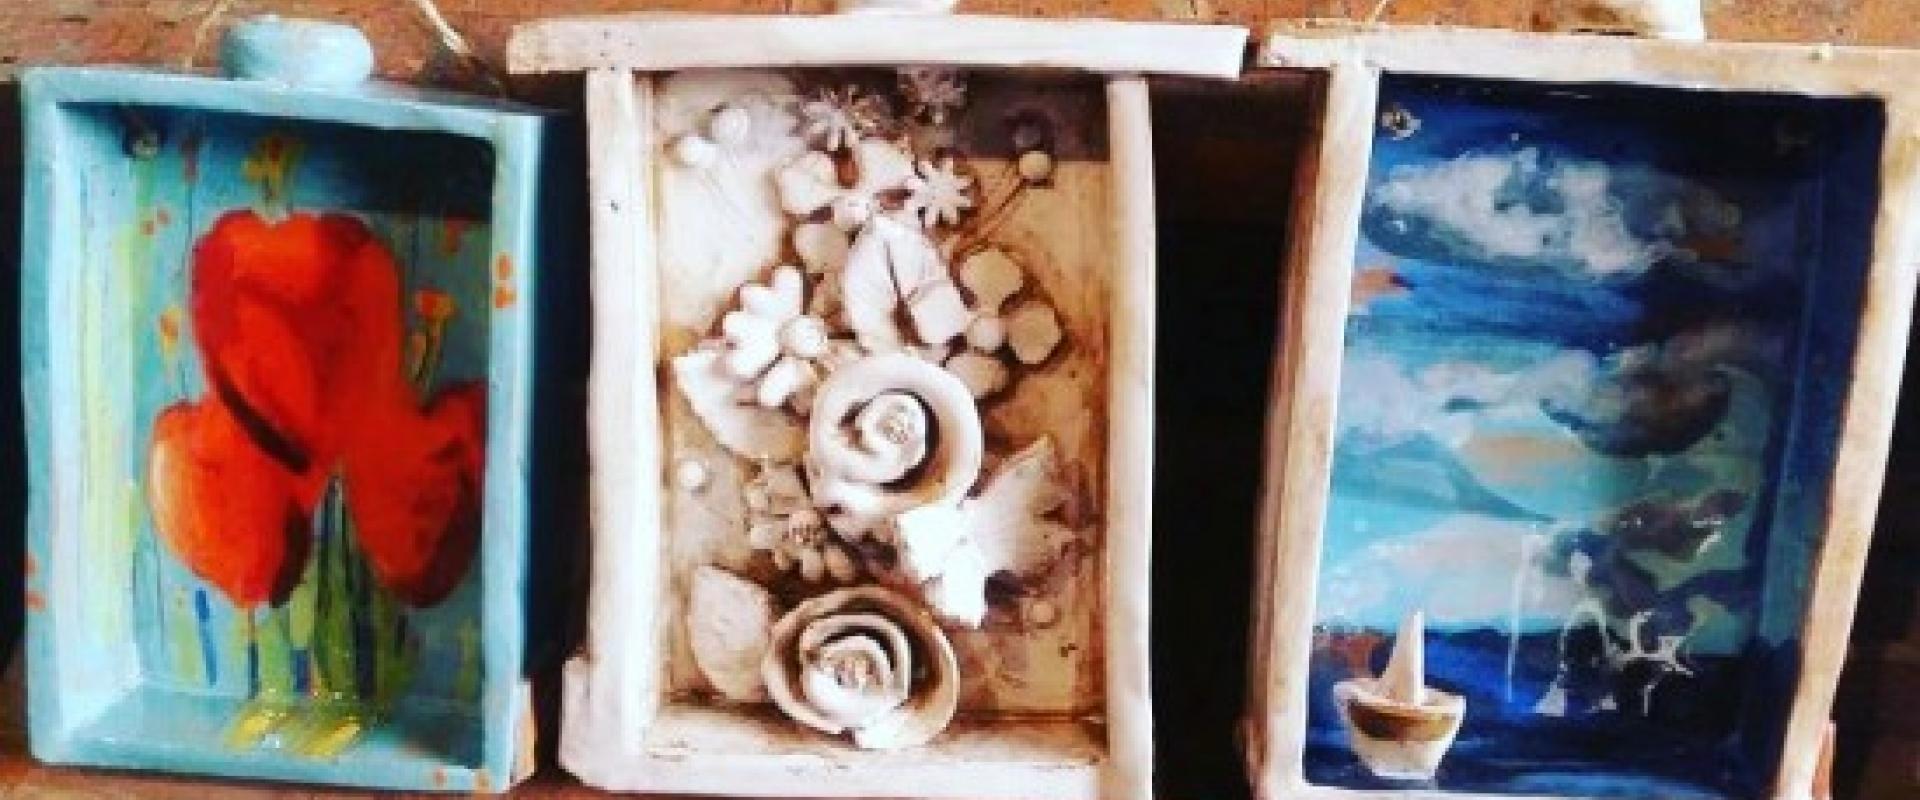 Ceramist craft shop Tuscany